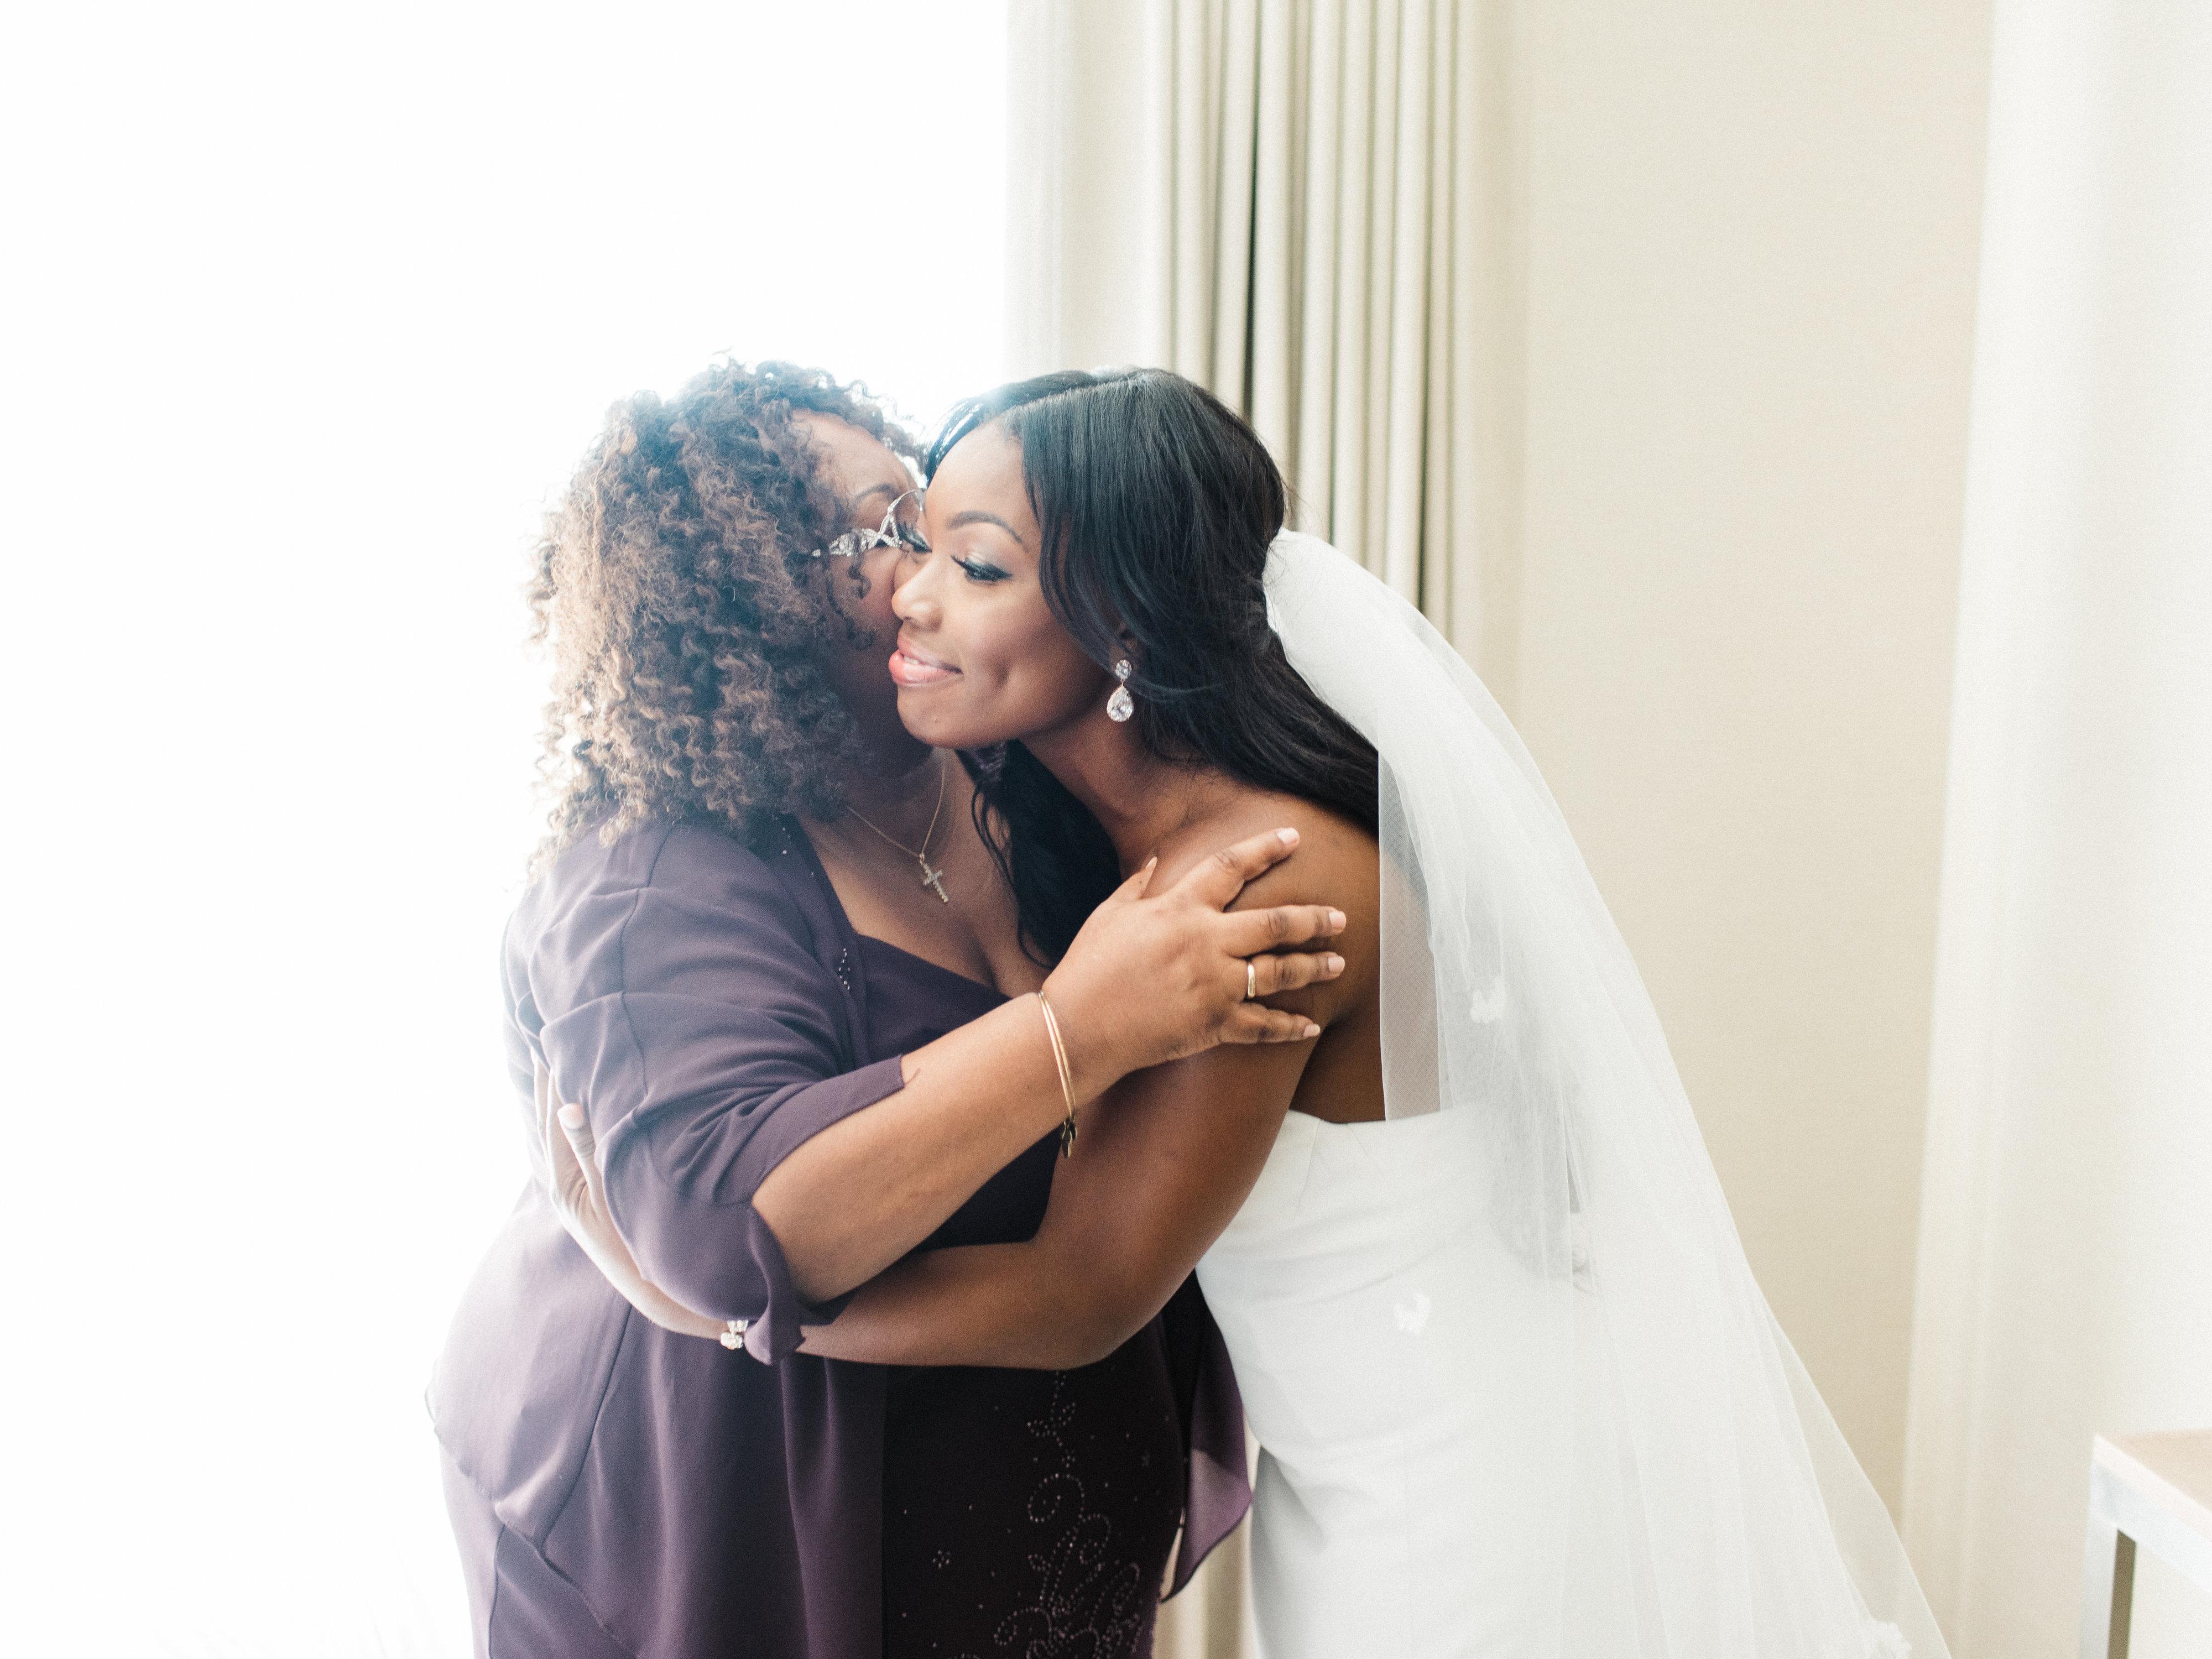 shanice & stephen wedding shanice's mom